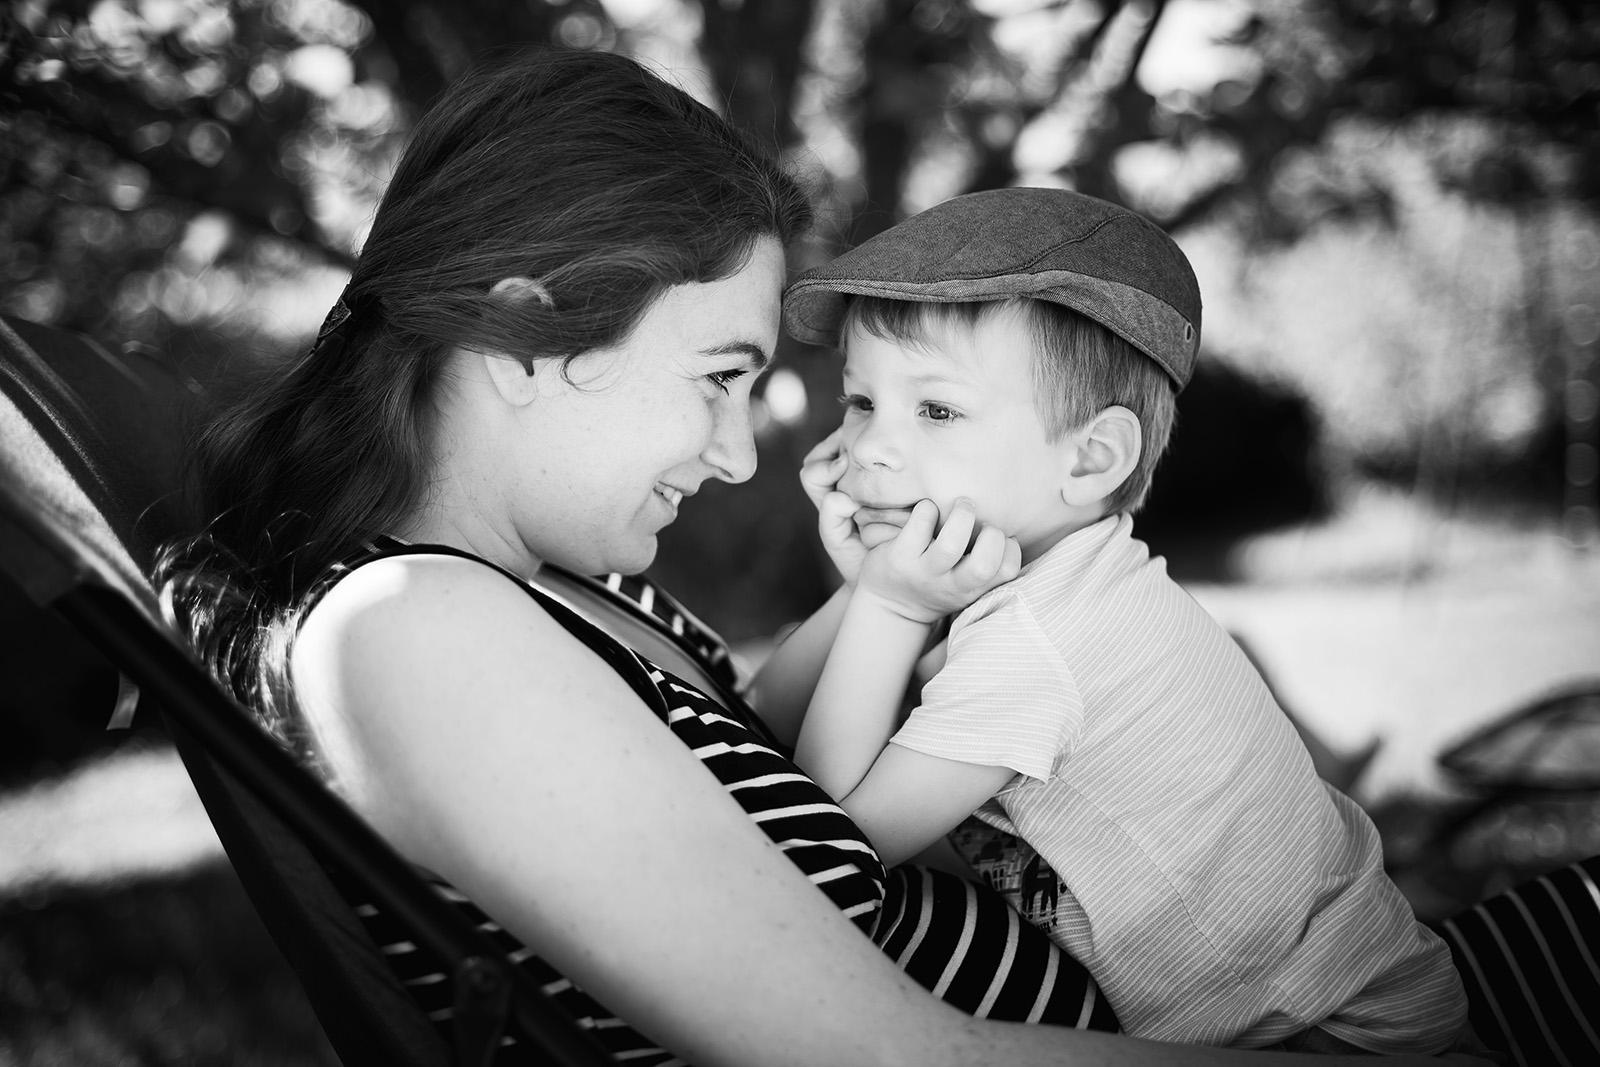 seance-photo-famille-elise-julliard-photographe-lyon-annecy-haute-savoie-grossesse-maternite-bebe-enfant-reportage-lifetstyle-auvergne-rhone-alpes-3